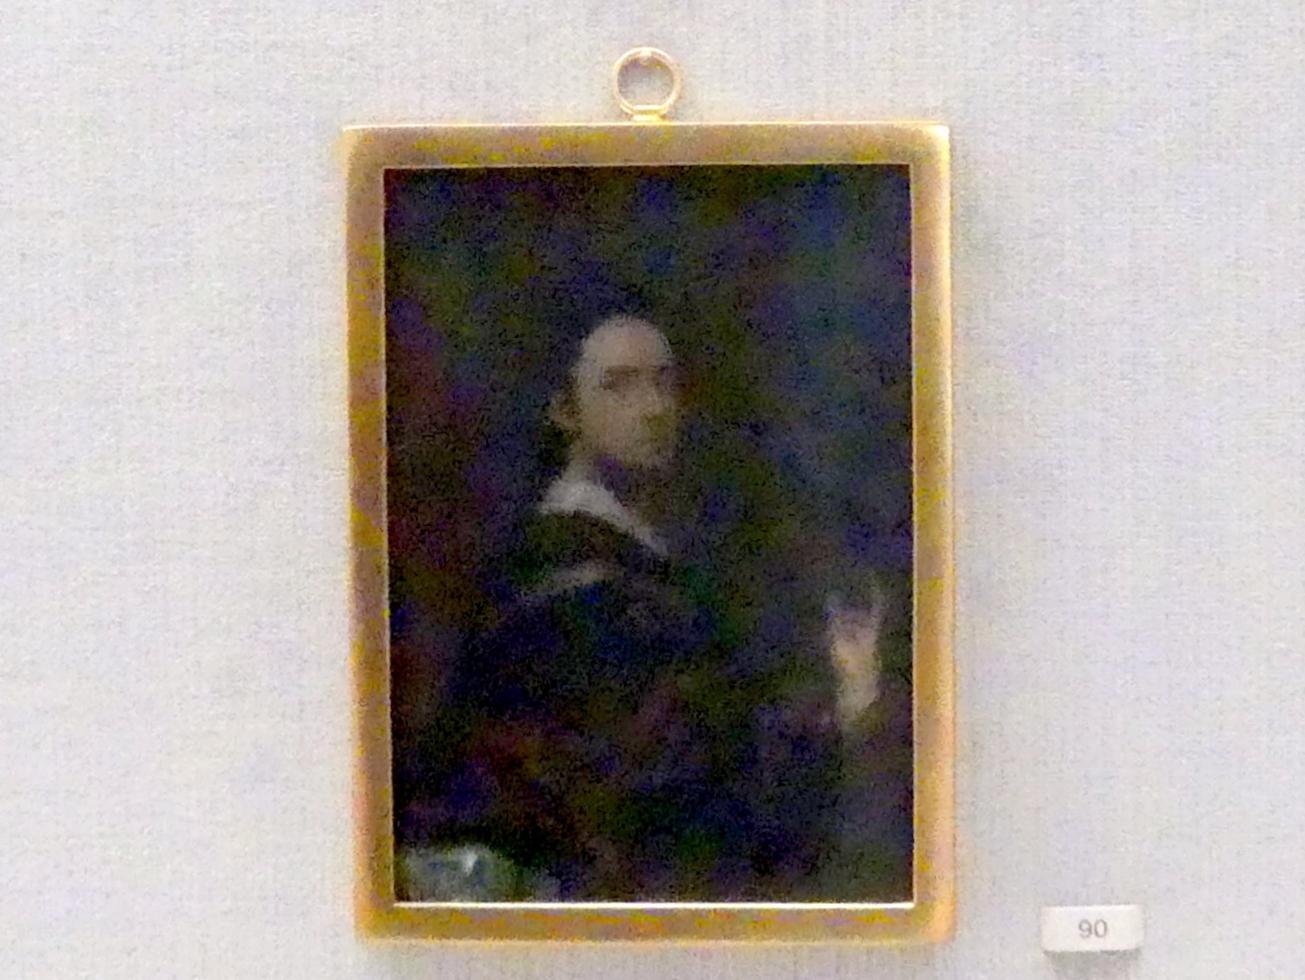 Ismael Mengs: Selbstbildnis, um 1720